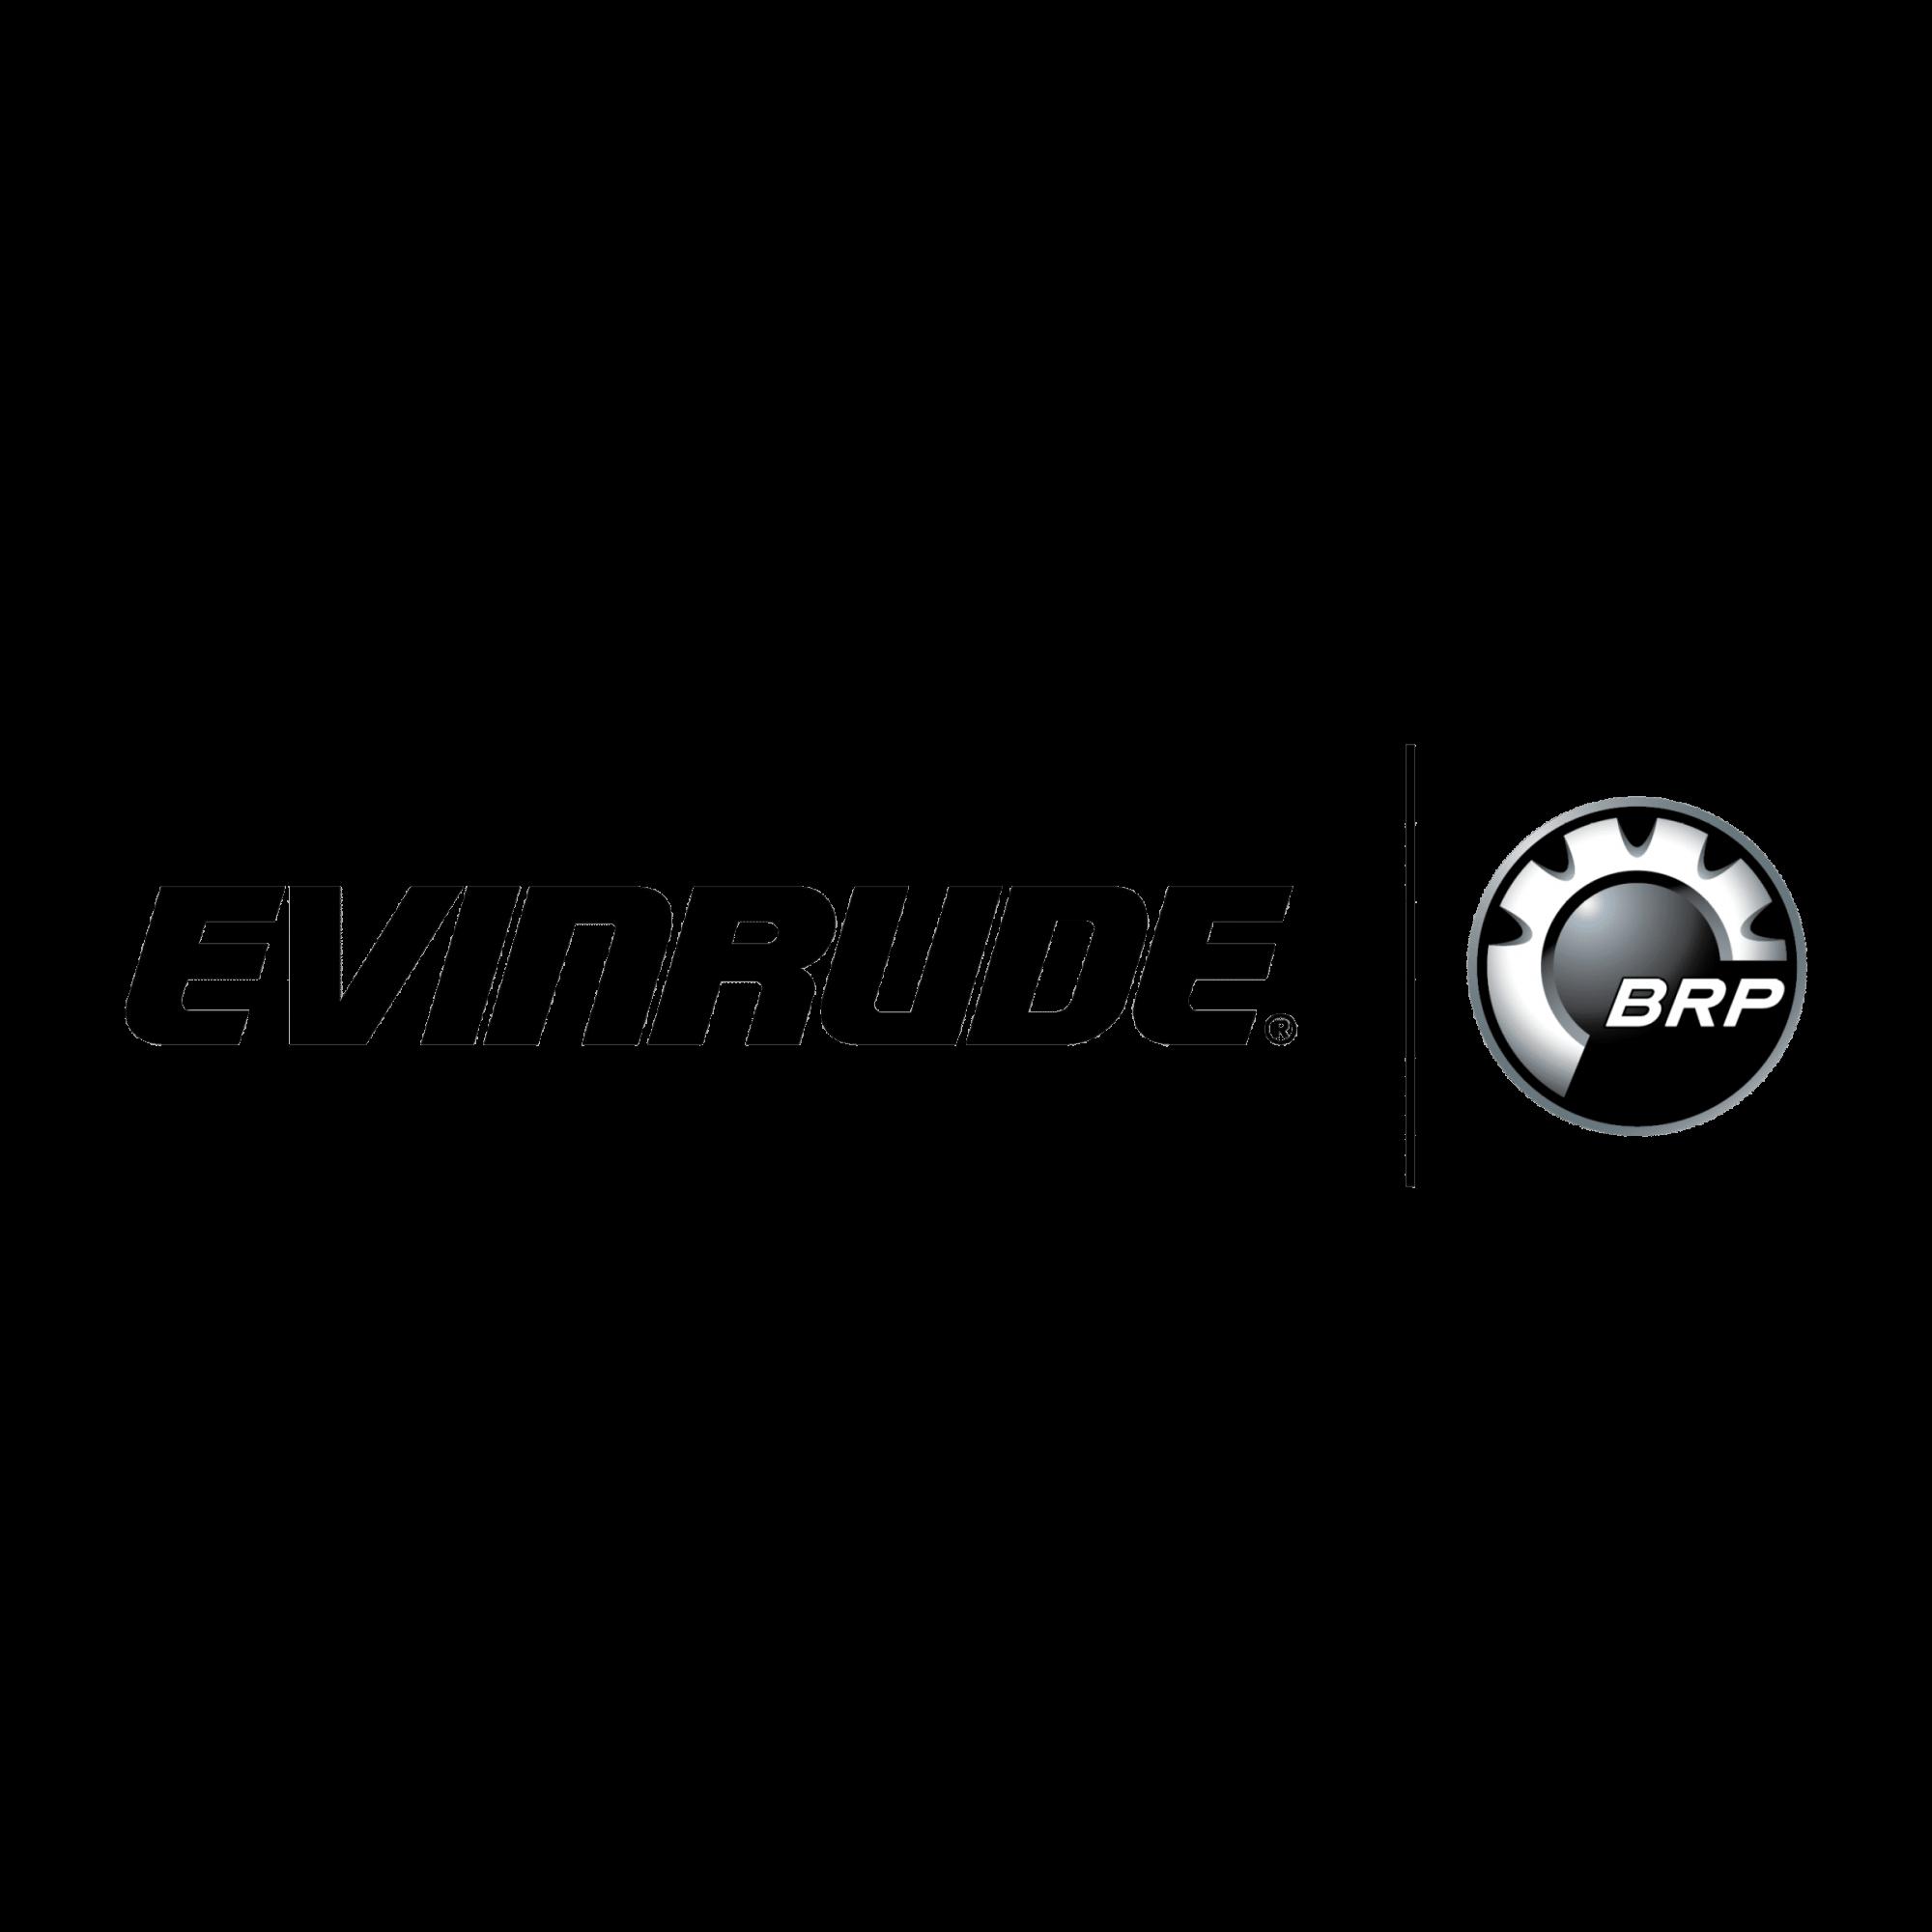 Evinrude 150HP E-TEC G2 H.O. - EVINRUDELOGO